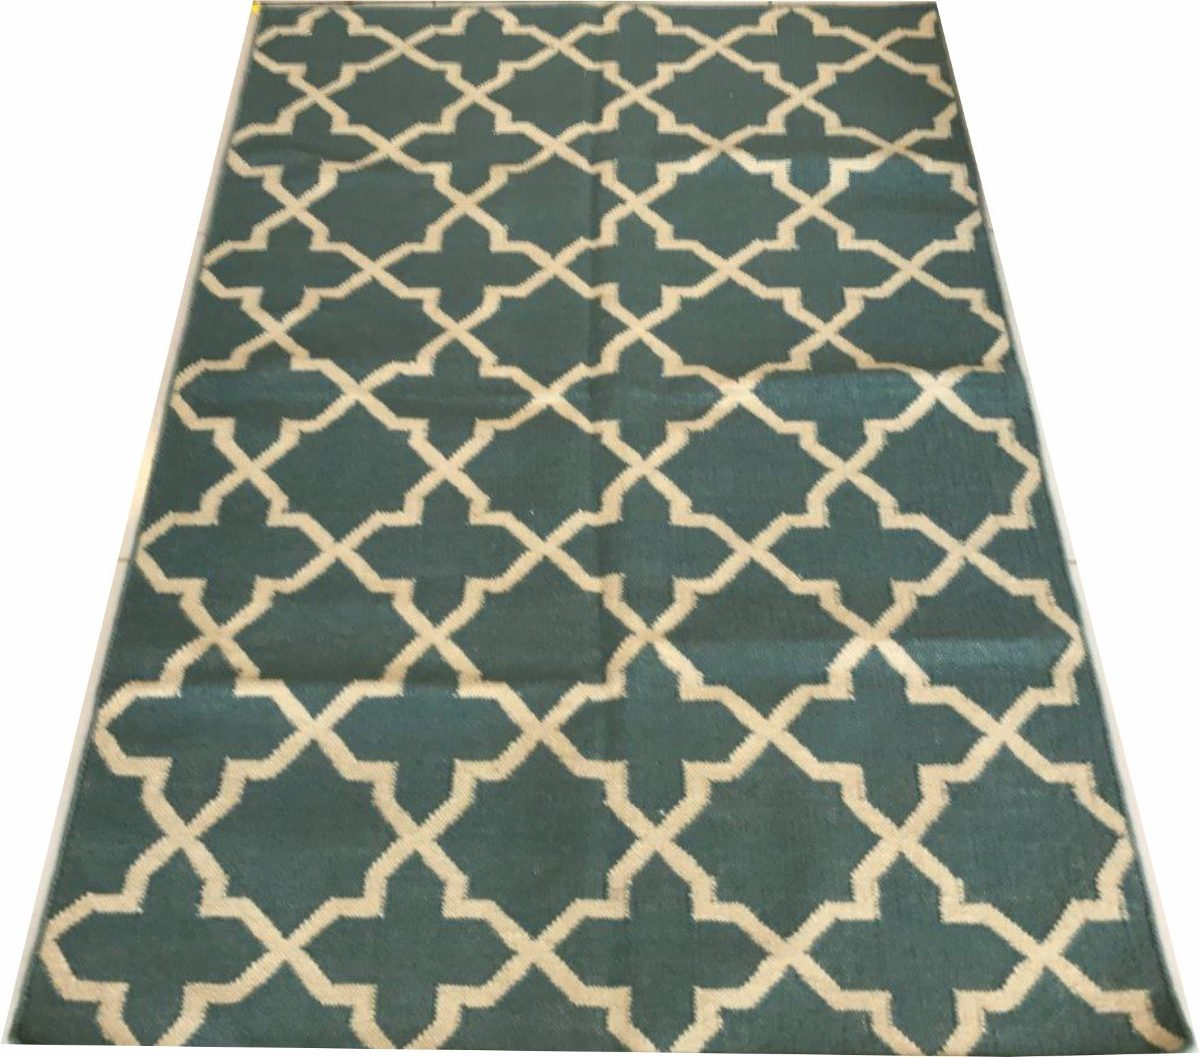 Tapete Kelim Verde Indiano 1.8x1.2m Geometrico 180x120cm